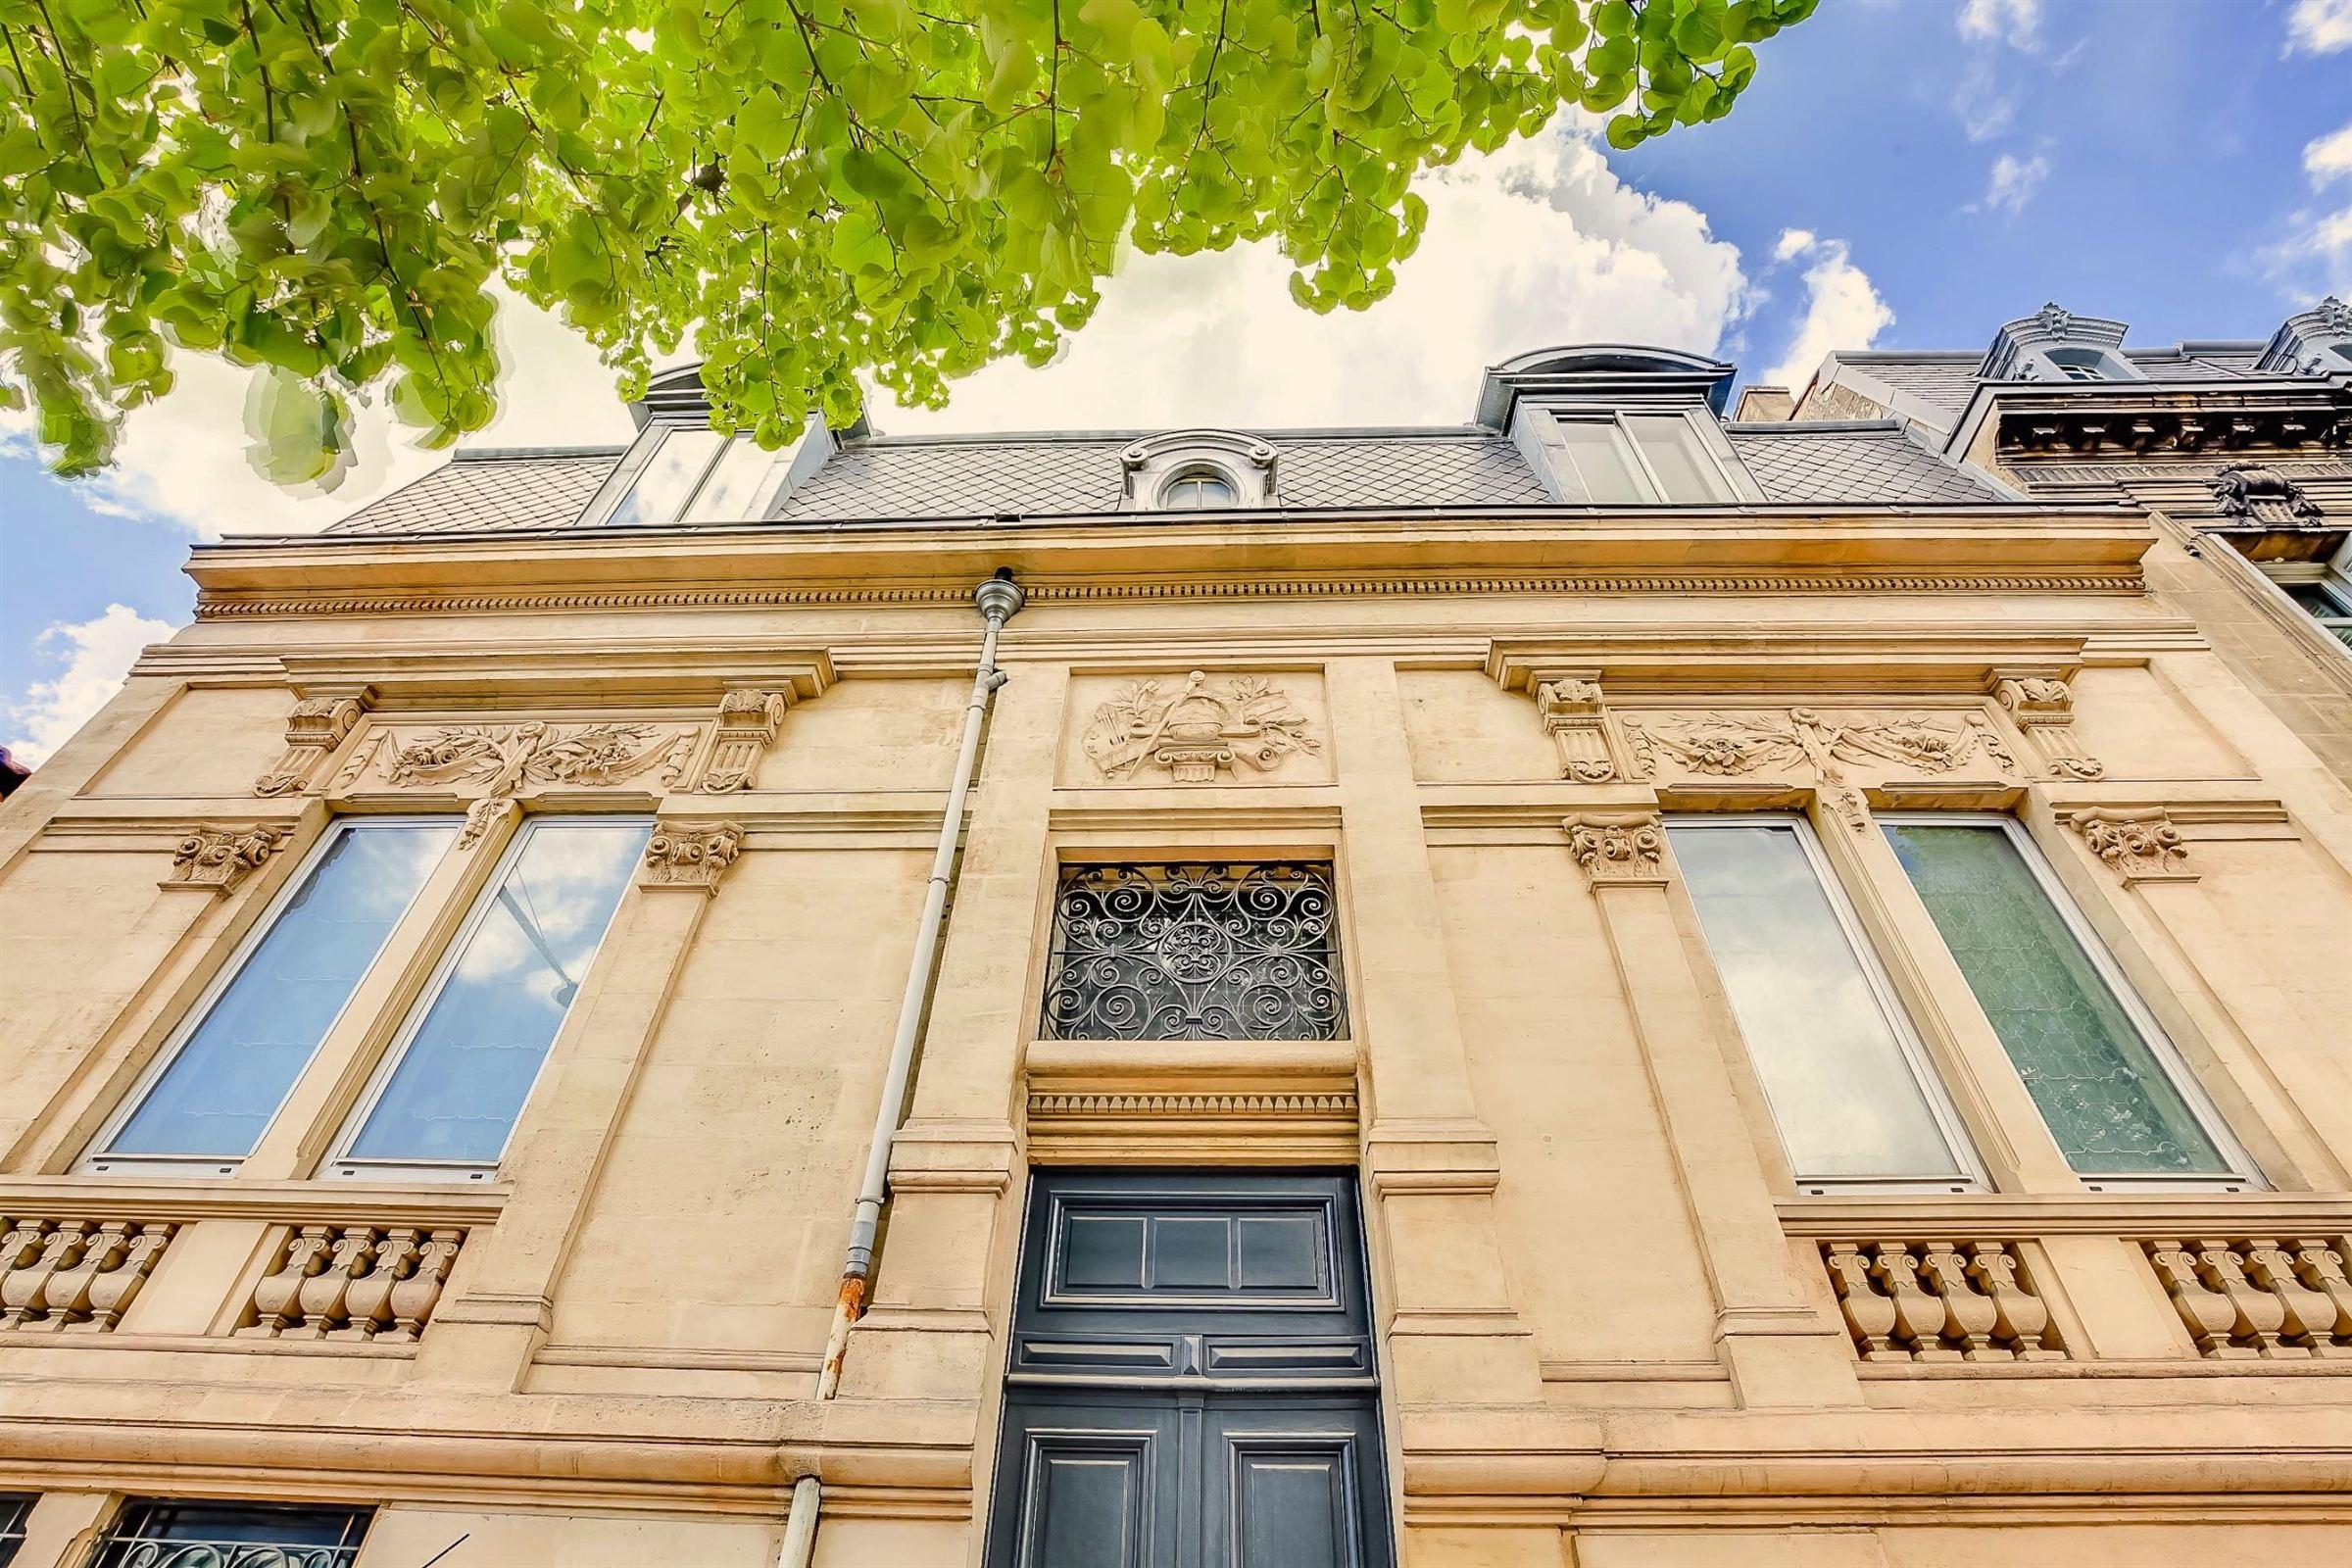 Single Family Home for Sale at DOWNTOWN BORDEAUX - GORGEOUS TOWN-HOUSE - SPA - PARKING Bordeaux, Aquitaine, 33000 France